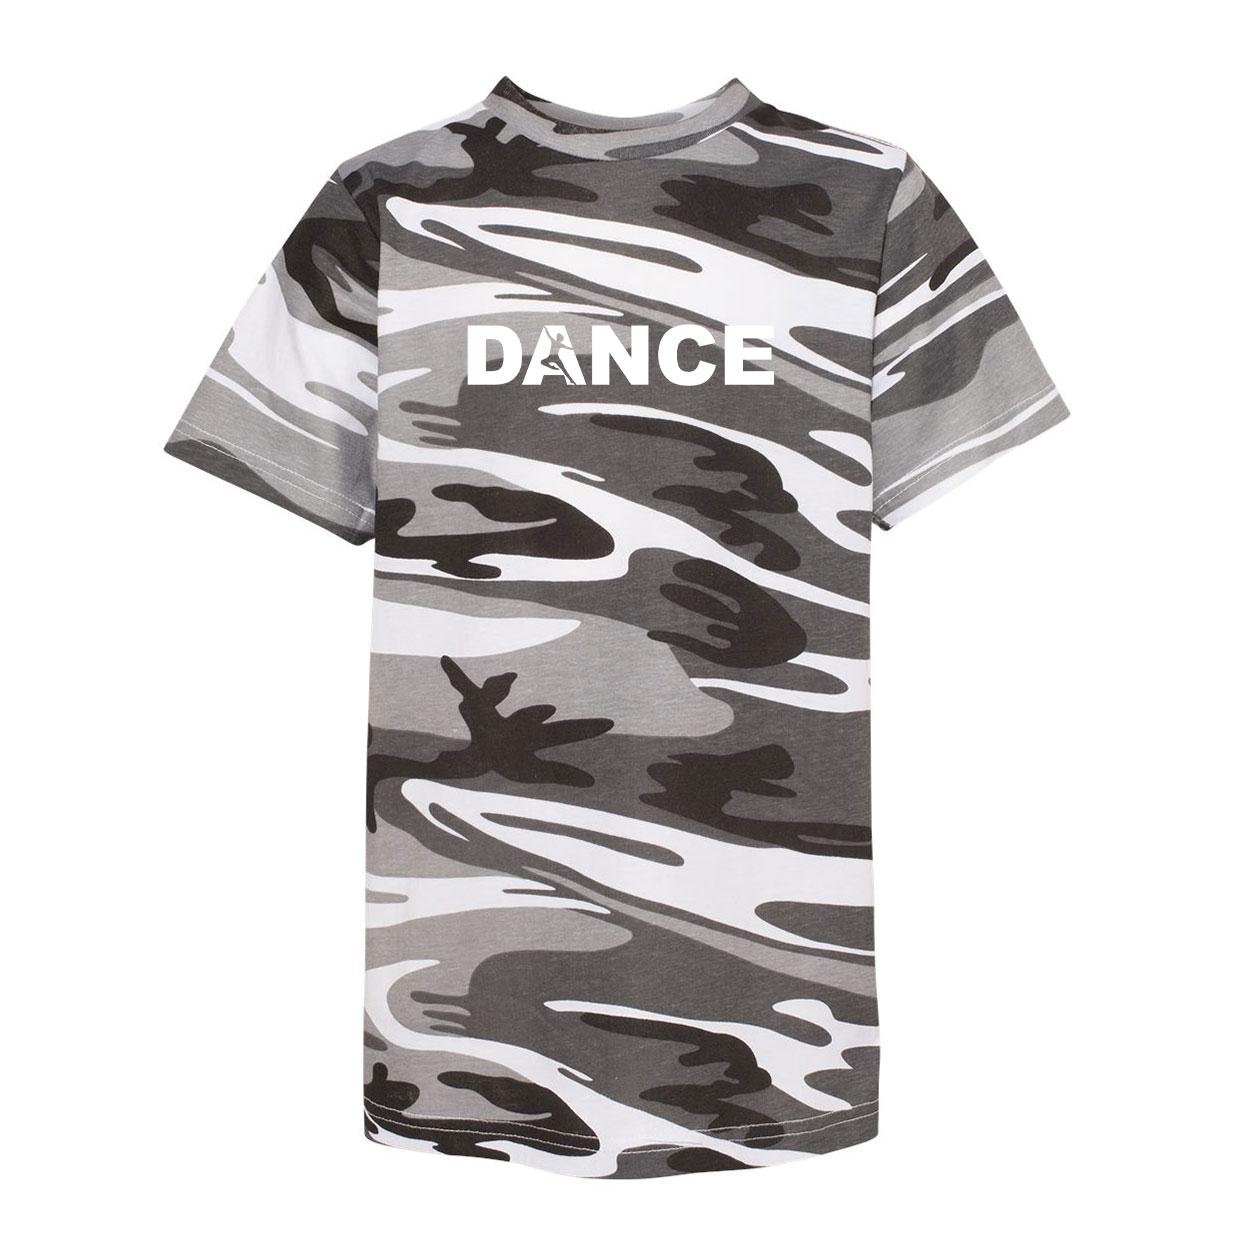 Dance Silhouette Logo Classic Youth Unisex T-Shirt Urban Camo (White Logo)